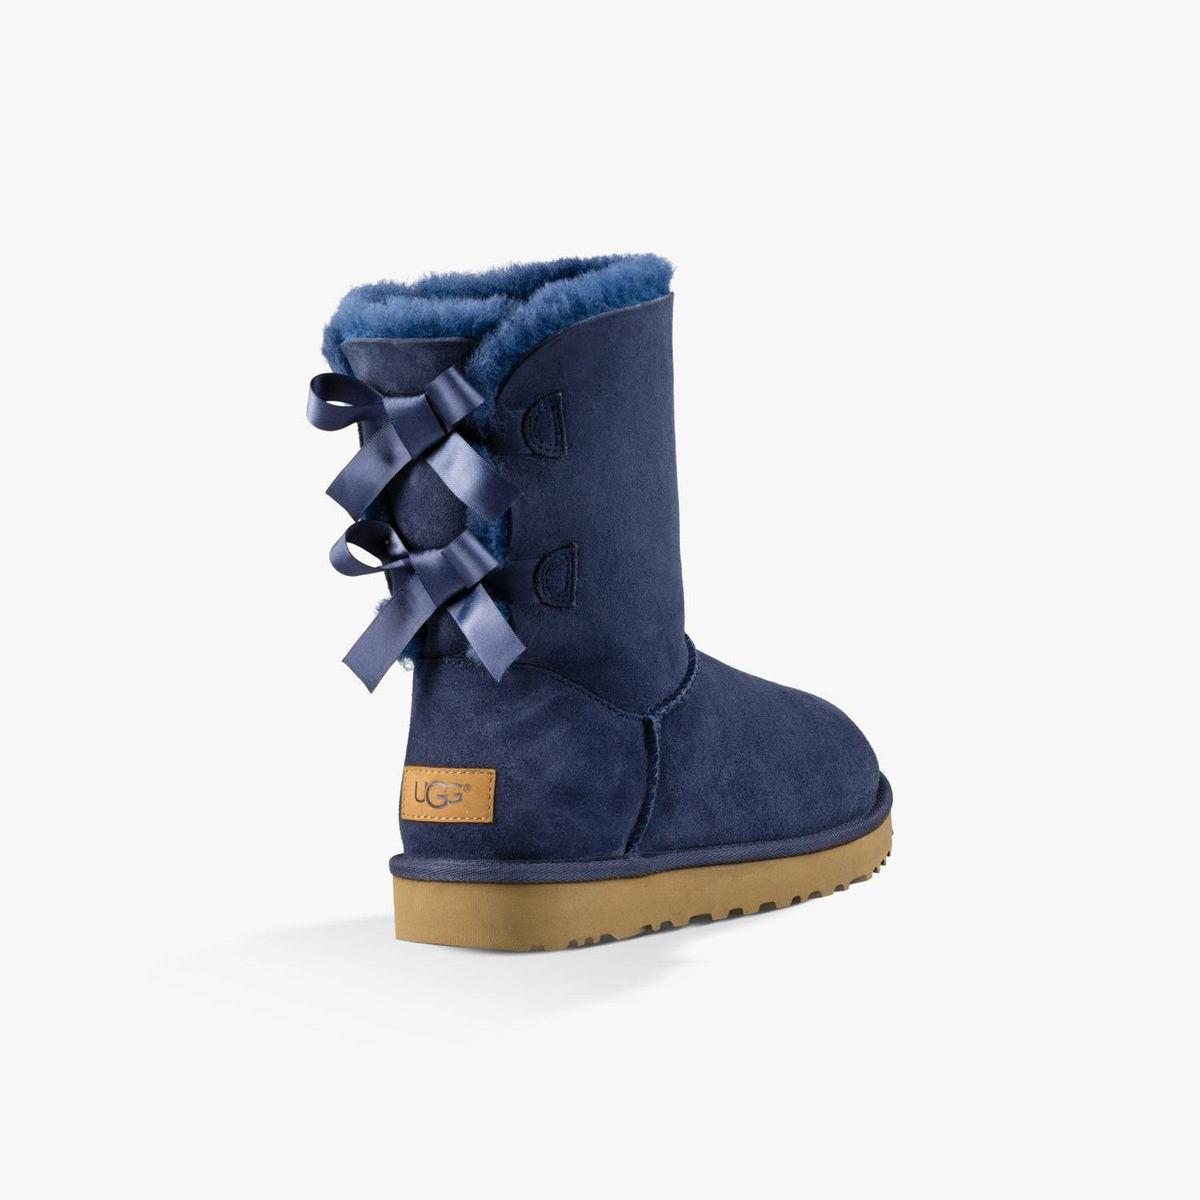 Ugg Bayan Bot Bailey Bow II Boot Lac 15_ZOOM